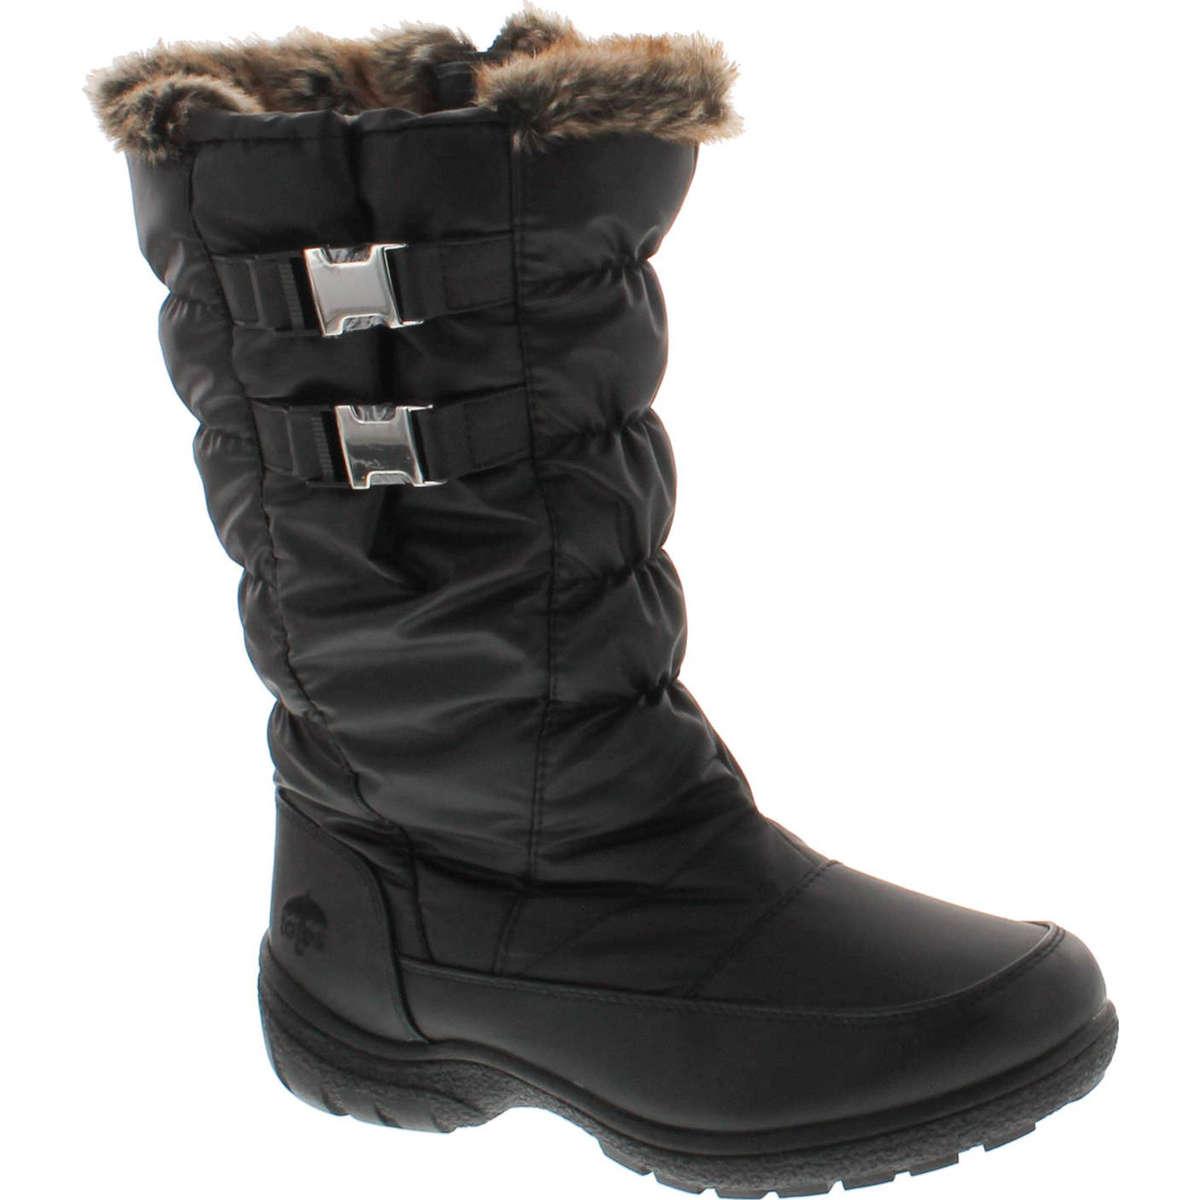 Totes Womens Bunny Waterproof Winter Snow Boots,Black,6 | eBay